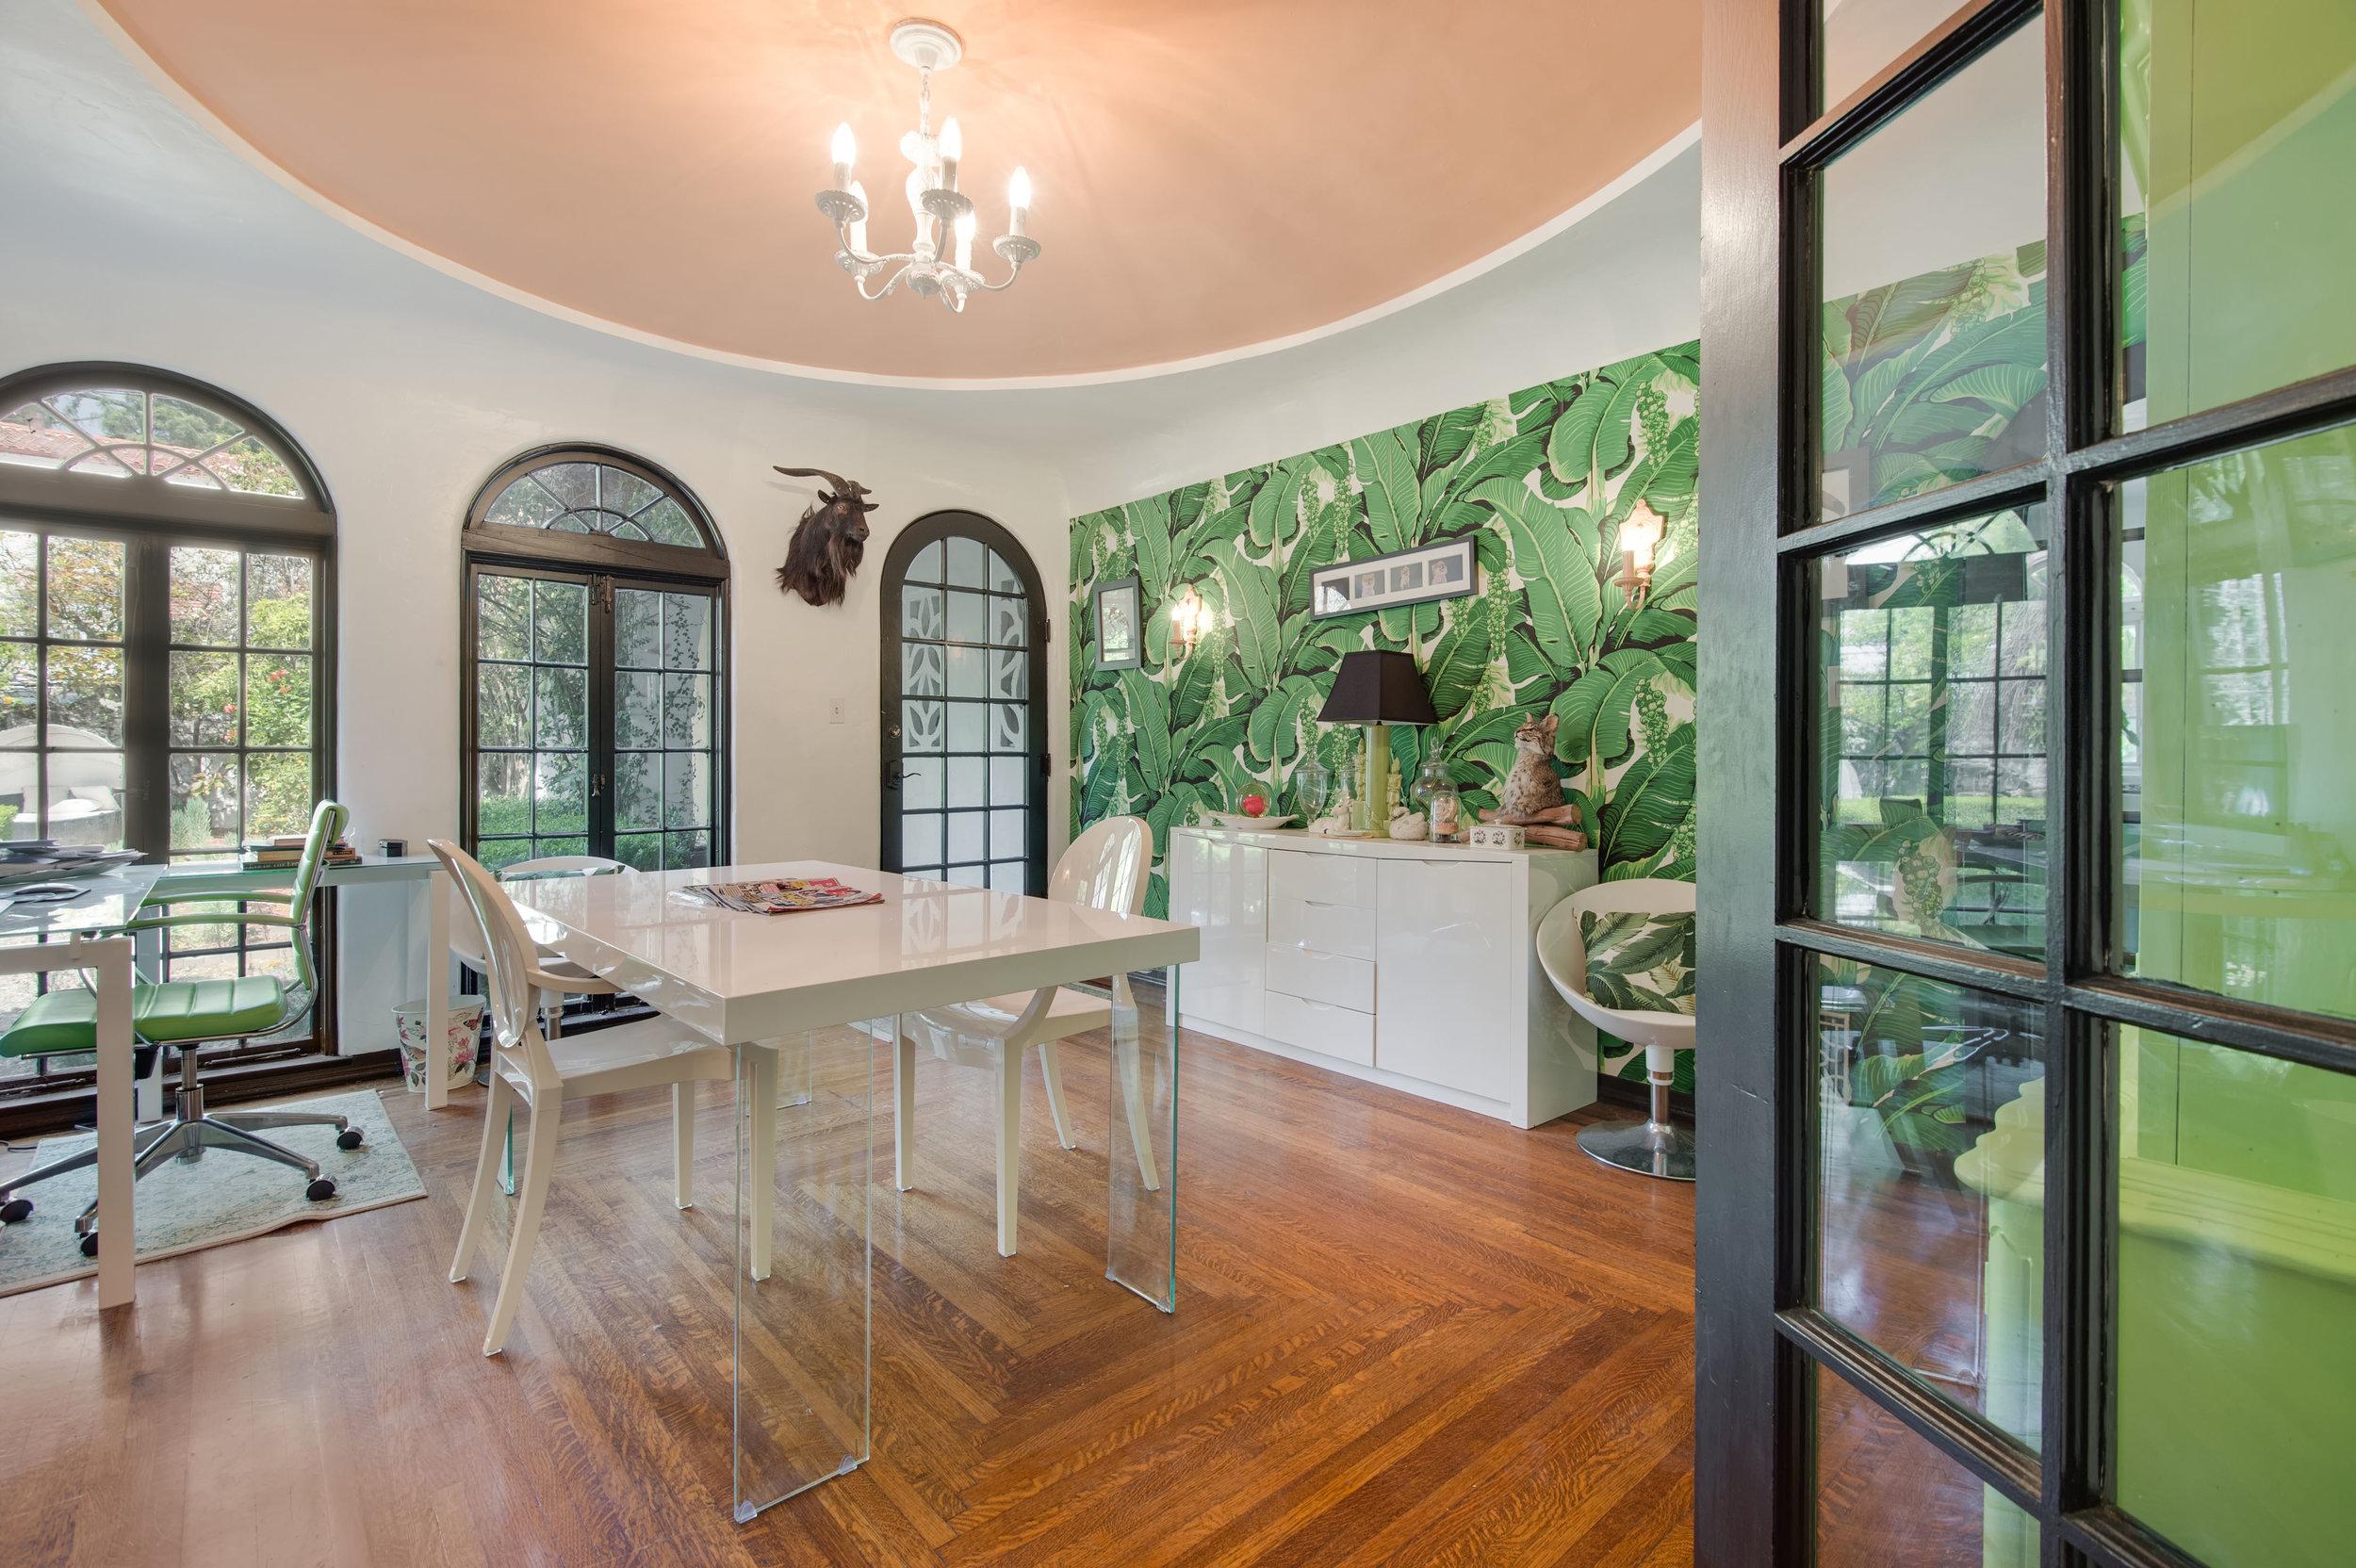 019 Office 006 Pool 4915 Los Feliz For Sale Los Angeles Lease The Malibu Life Team Luxury Real Estate.jpg